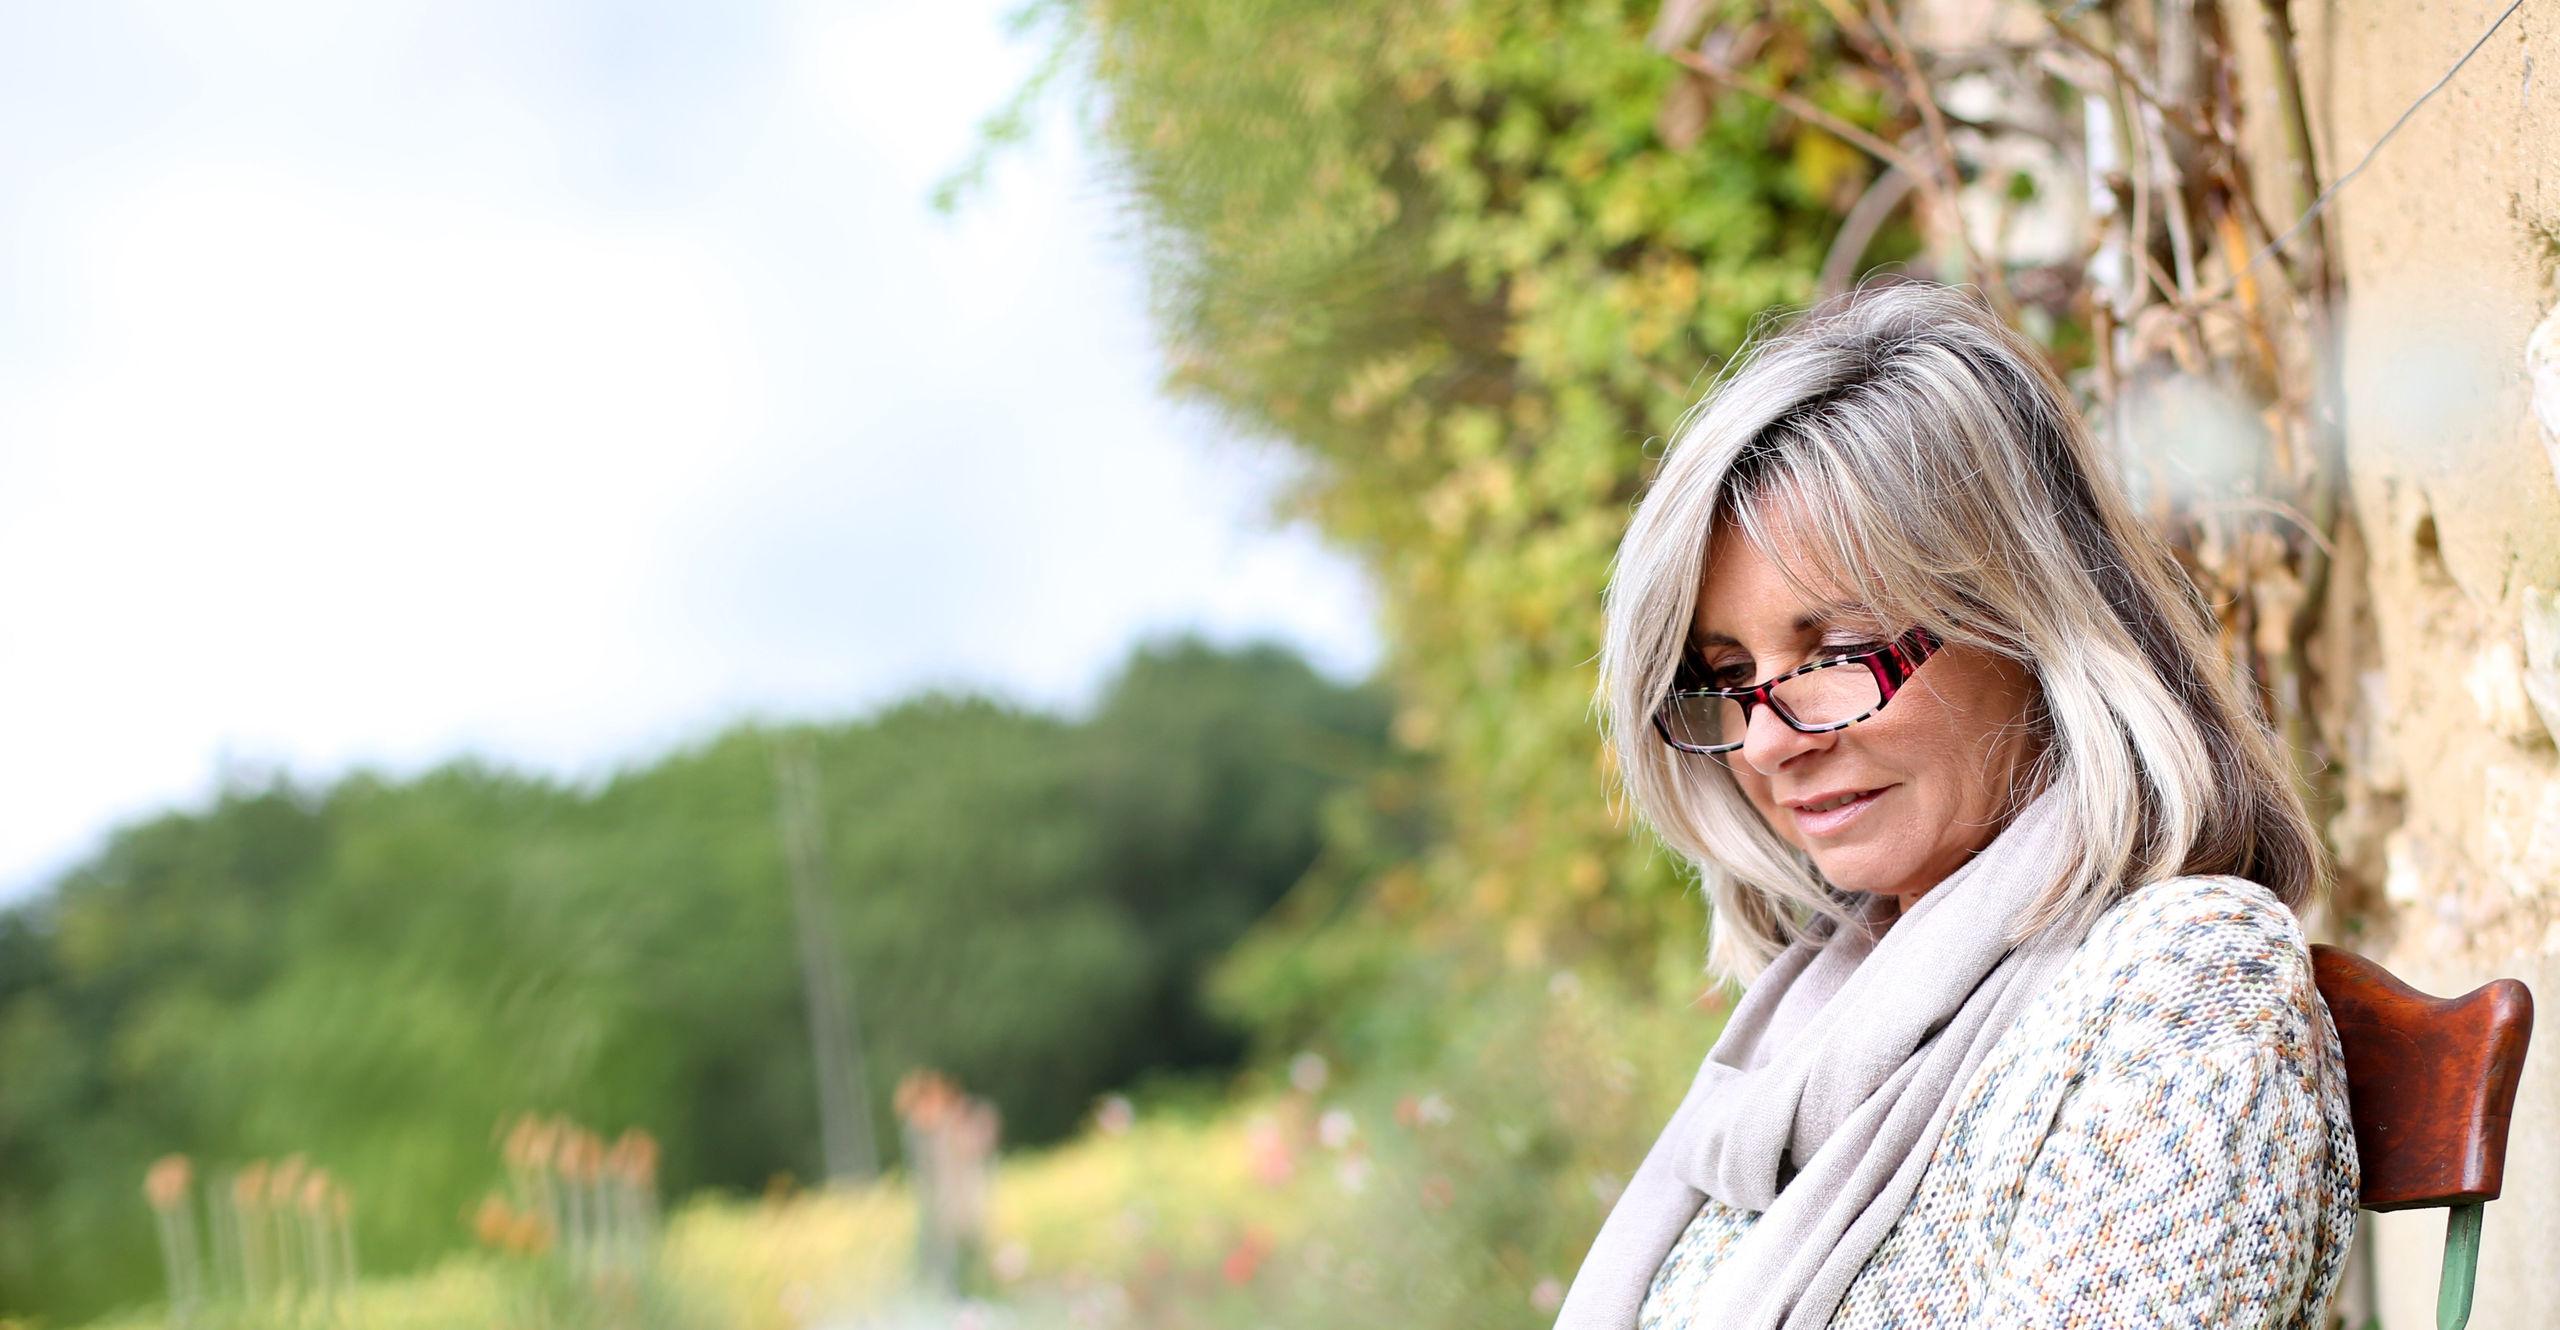 A lady sitting outside in a garden